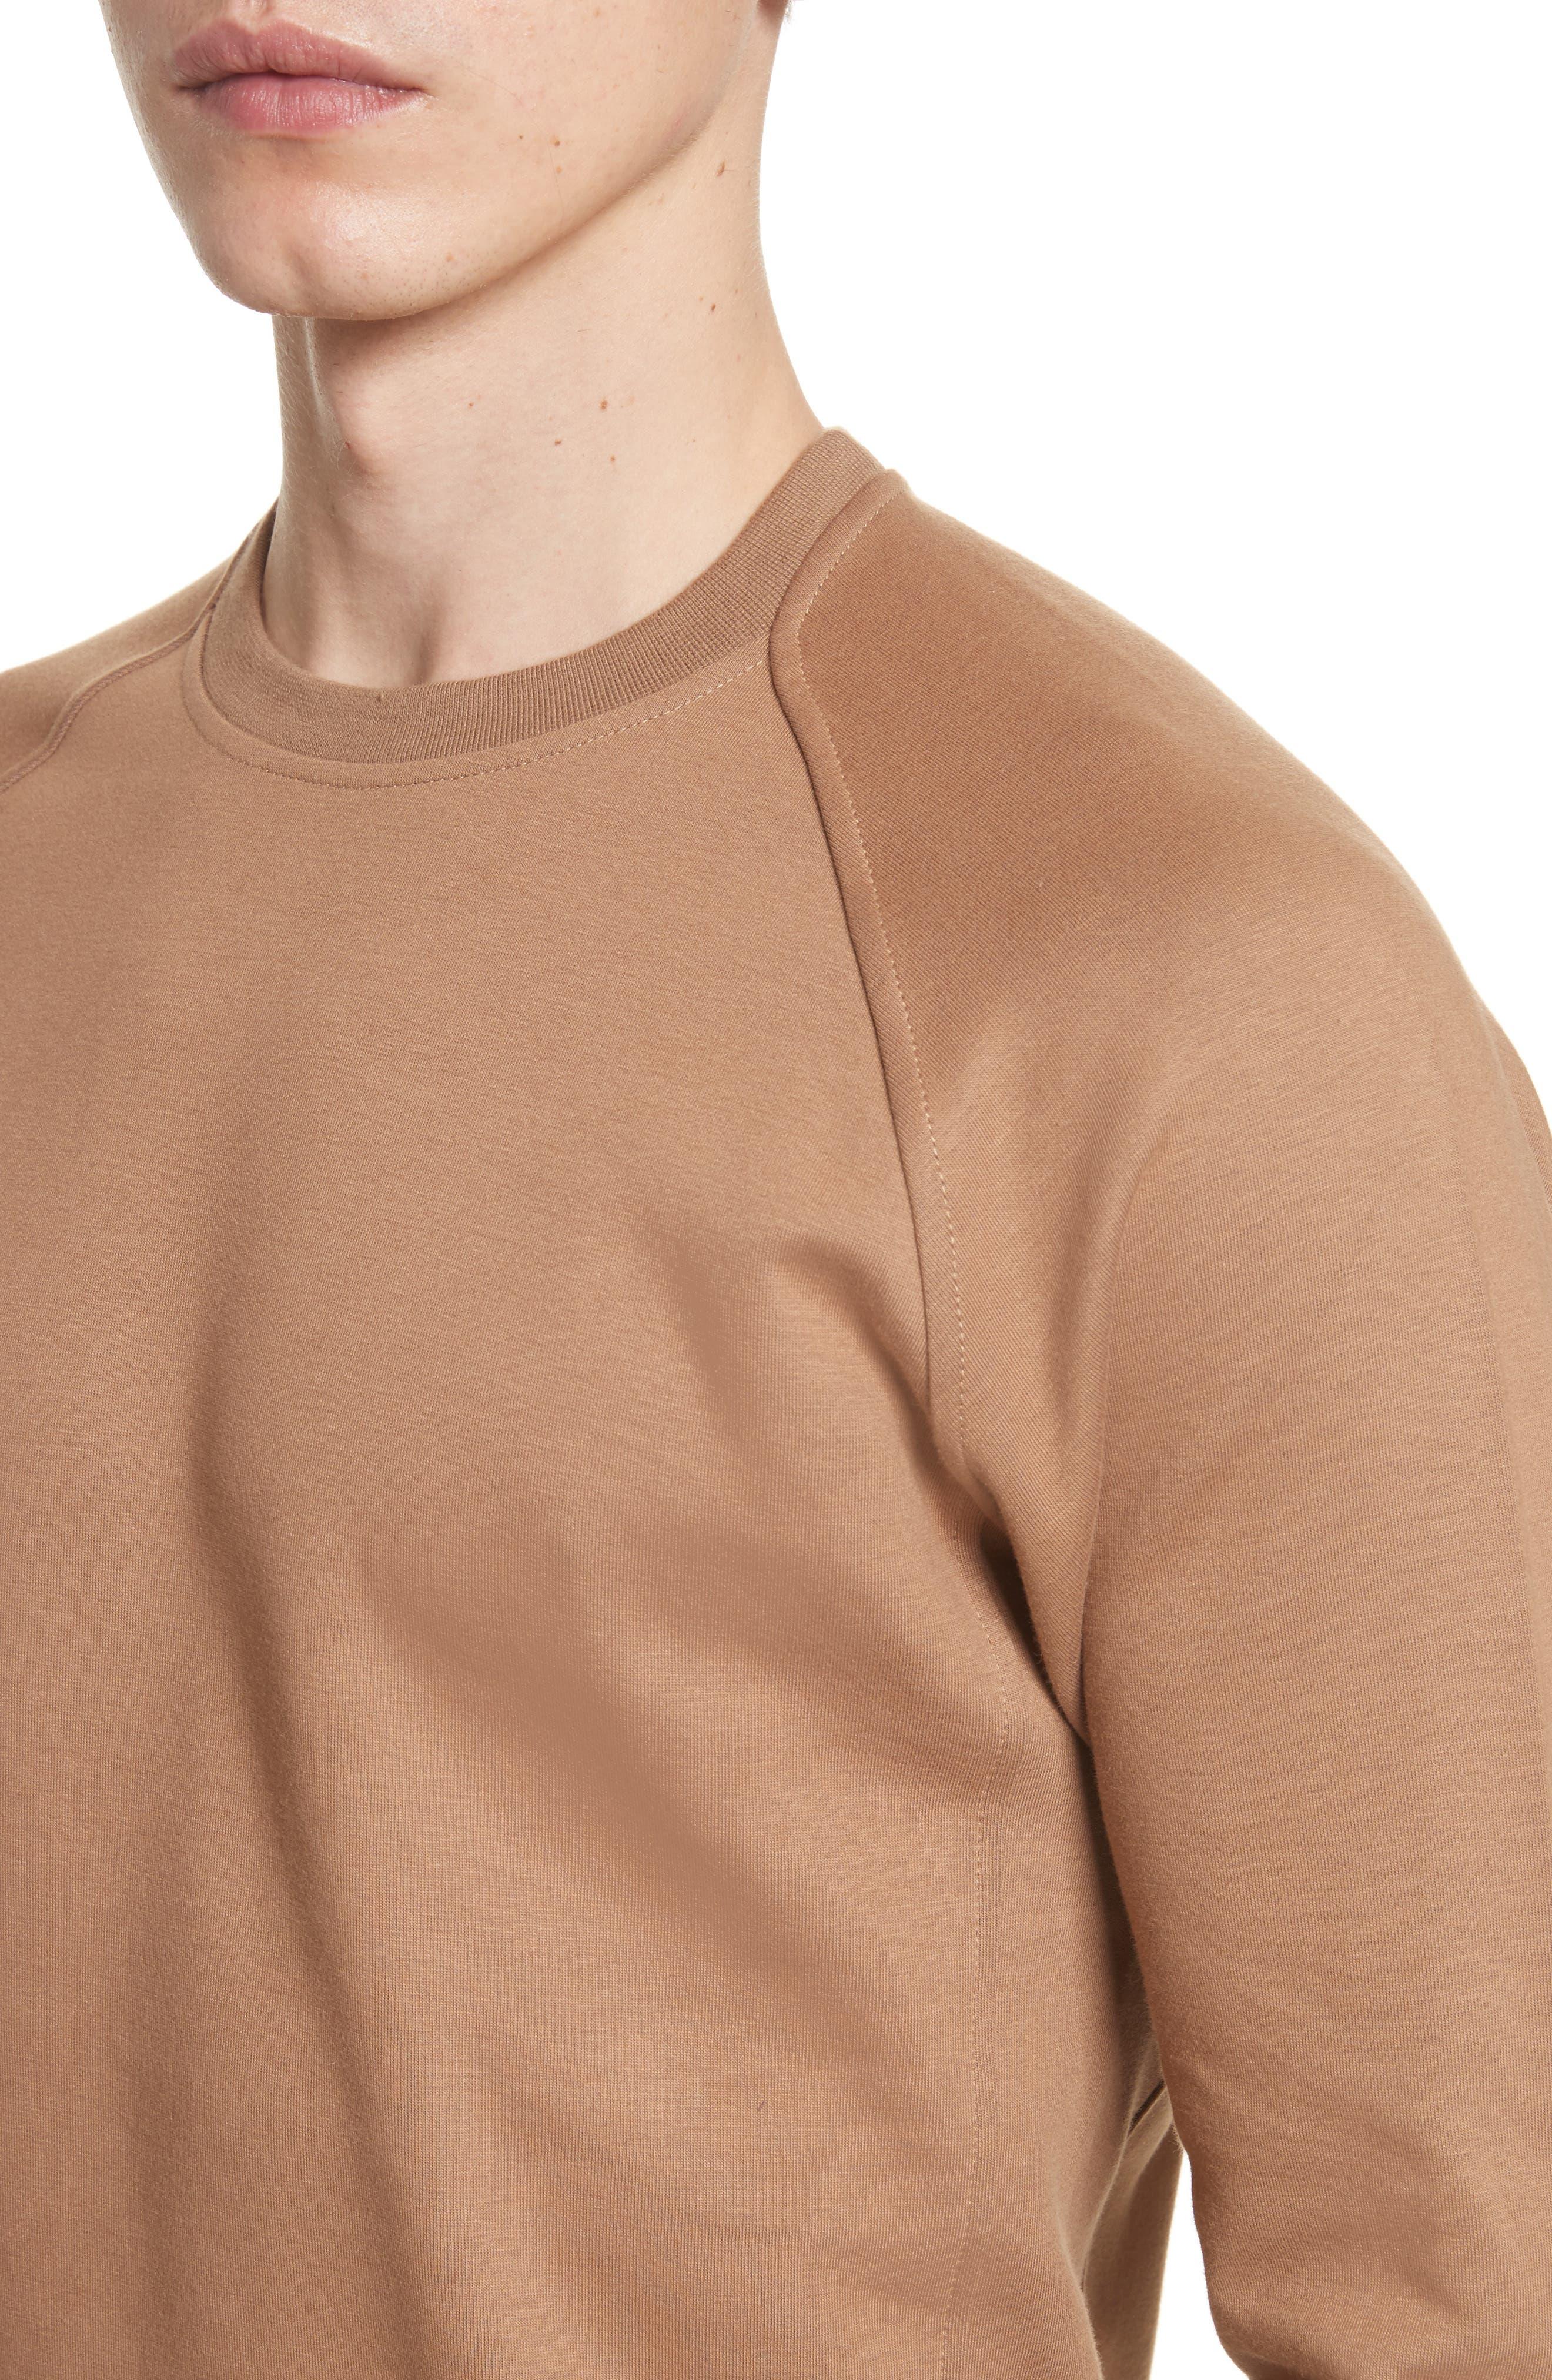 Ketel Dry Mercerized Crewneck Sweatshirt,                             Alternate thumbnail 4, color,                             Light Sand